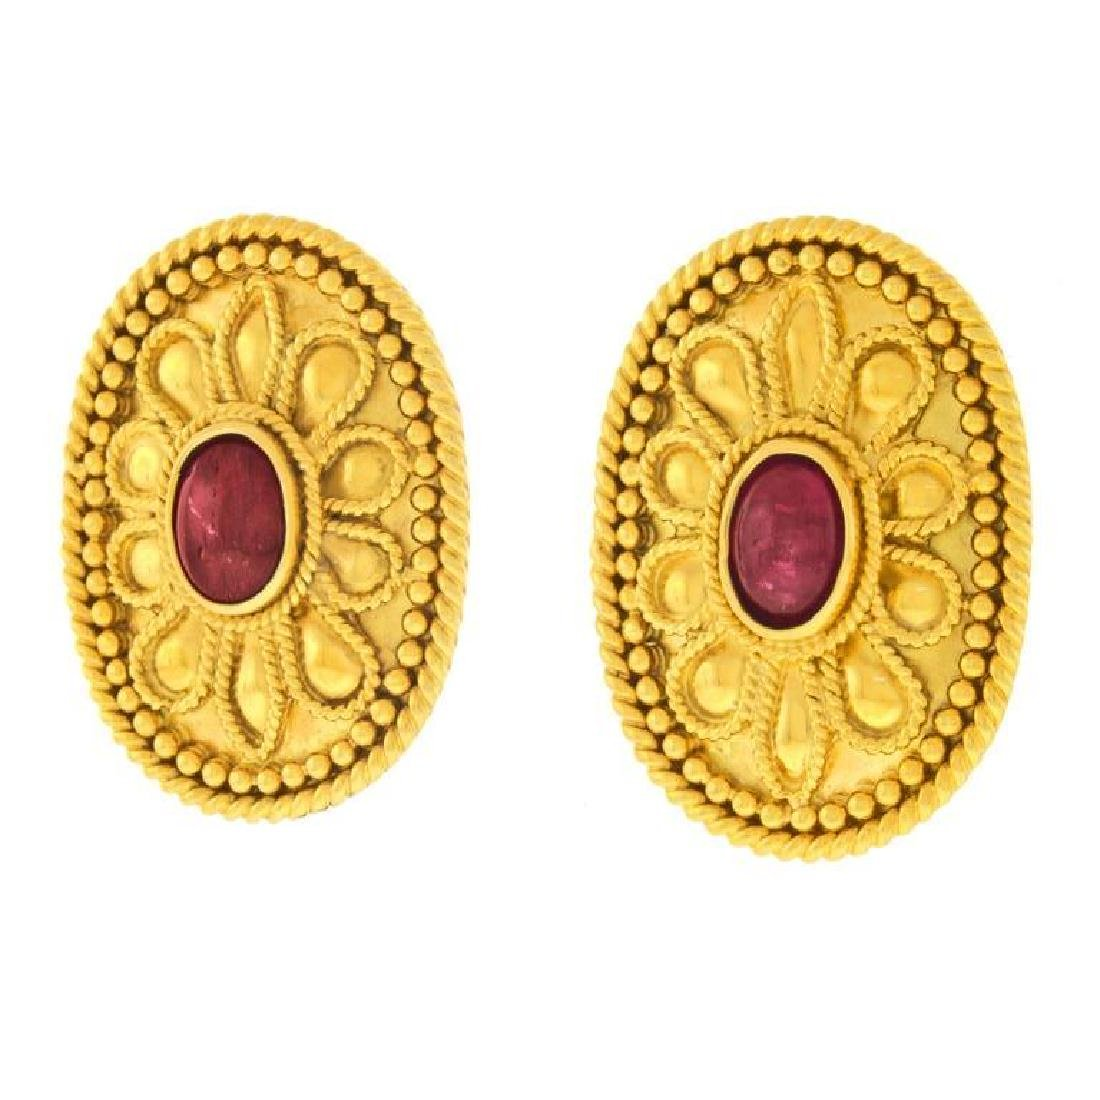 Archaic Motif 18k and Ruby Earrings - 2